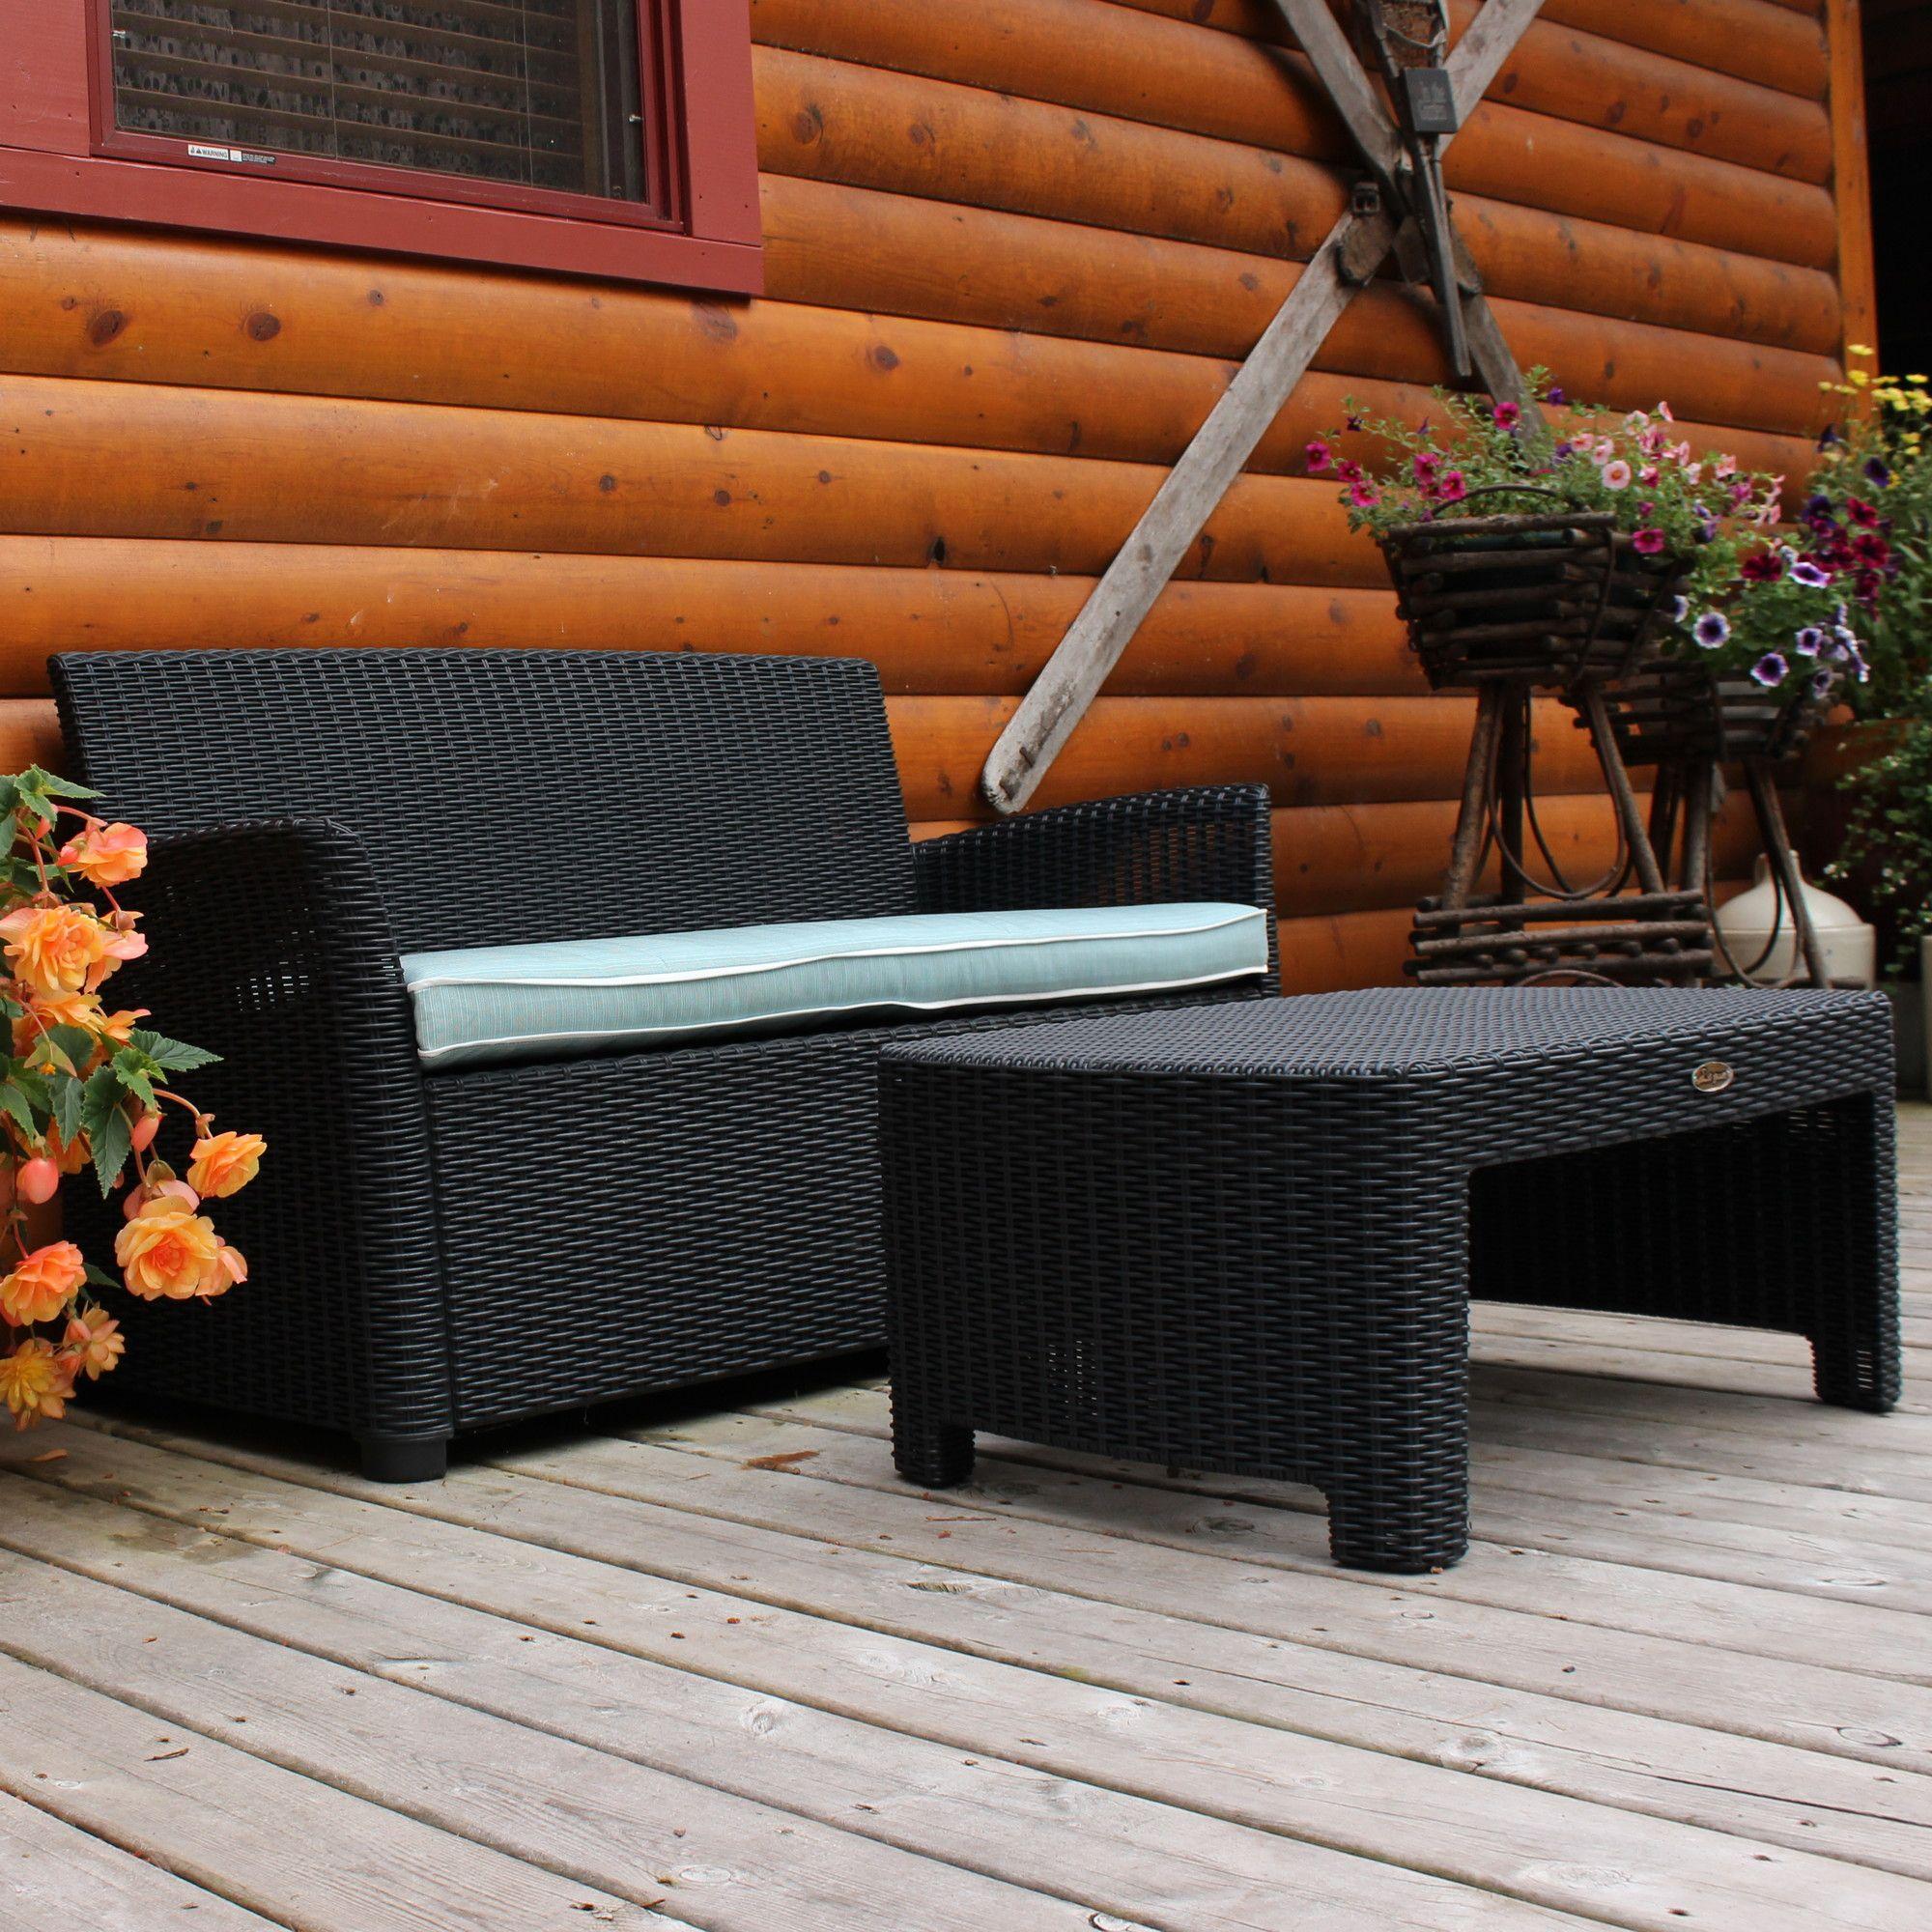 Gardenia 2 Piece Lounge Seating Group with Cushion